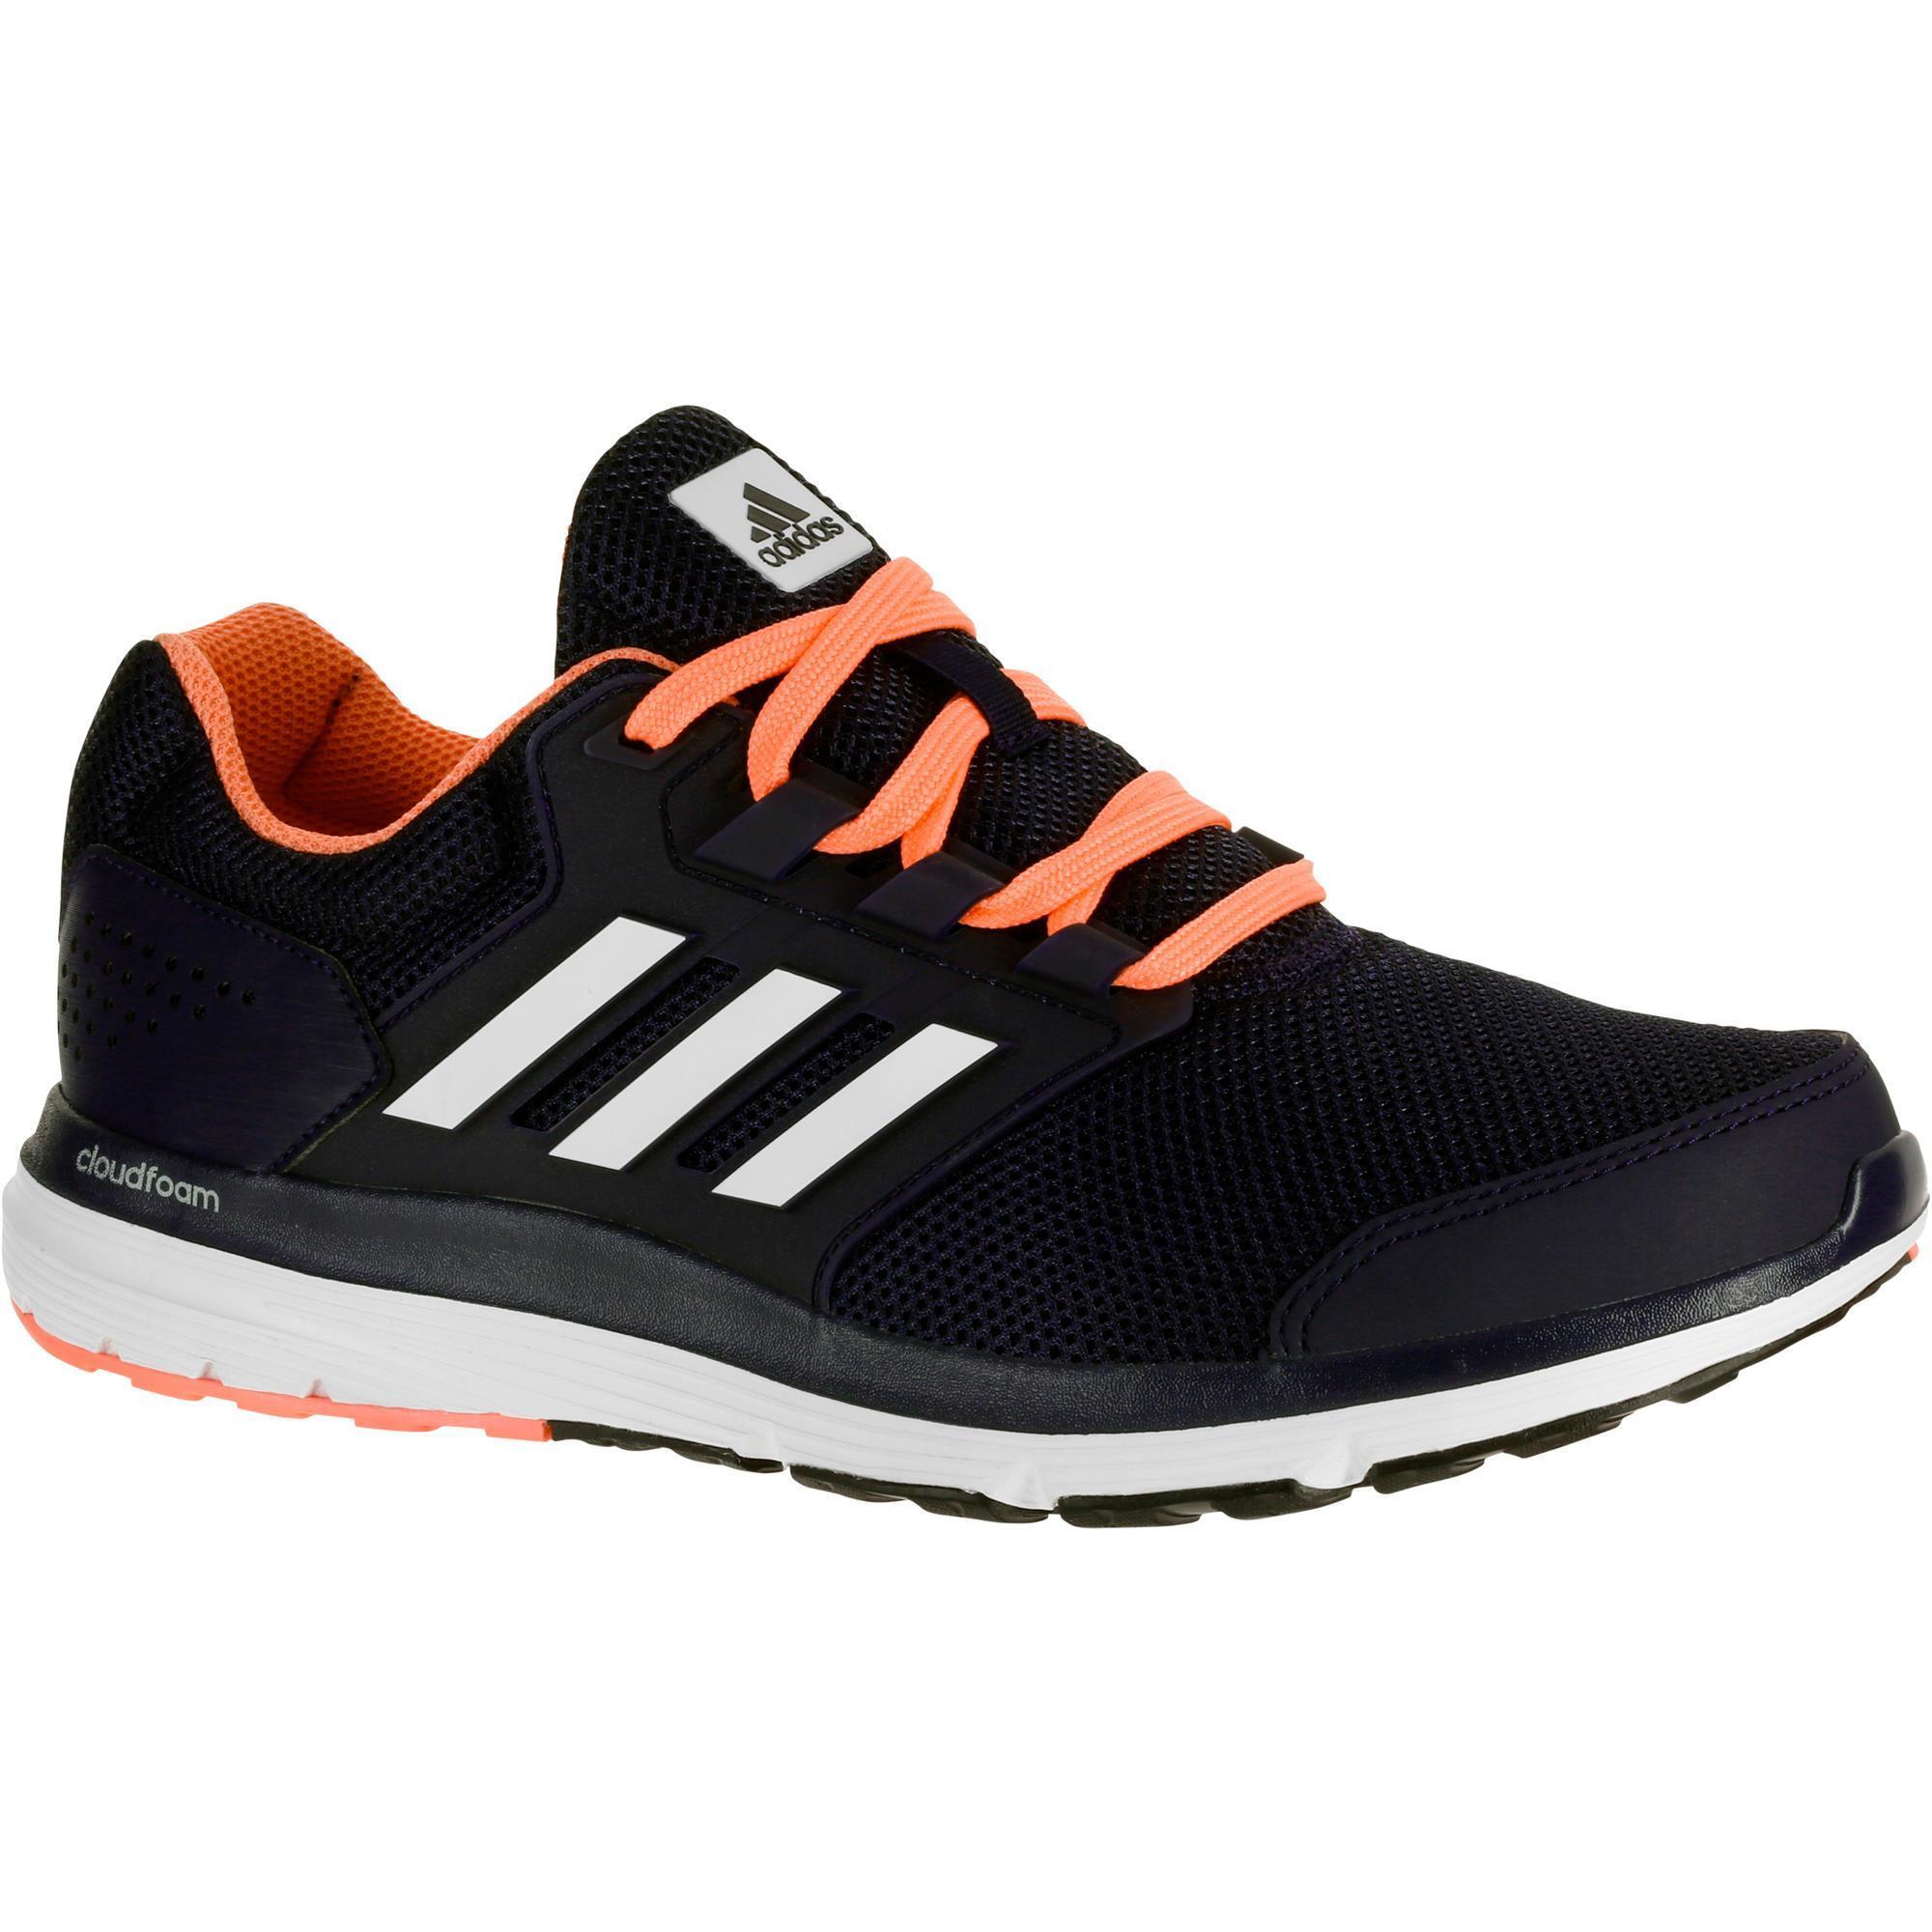 the best attitude 27e31 f0106 ZAPATILLAS JOGGING RUNNING ADIDAS GALAXY 4 MUJER NEGRO Adidas  Decathlon